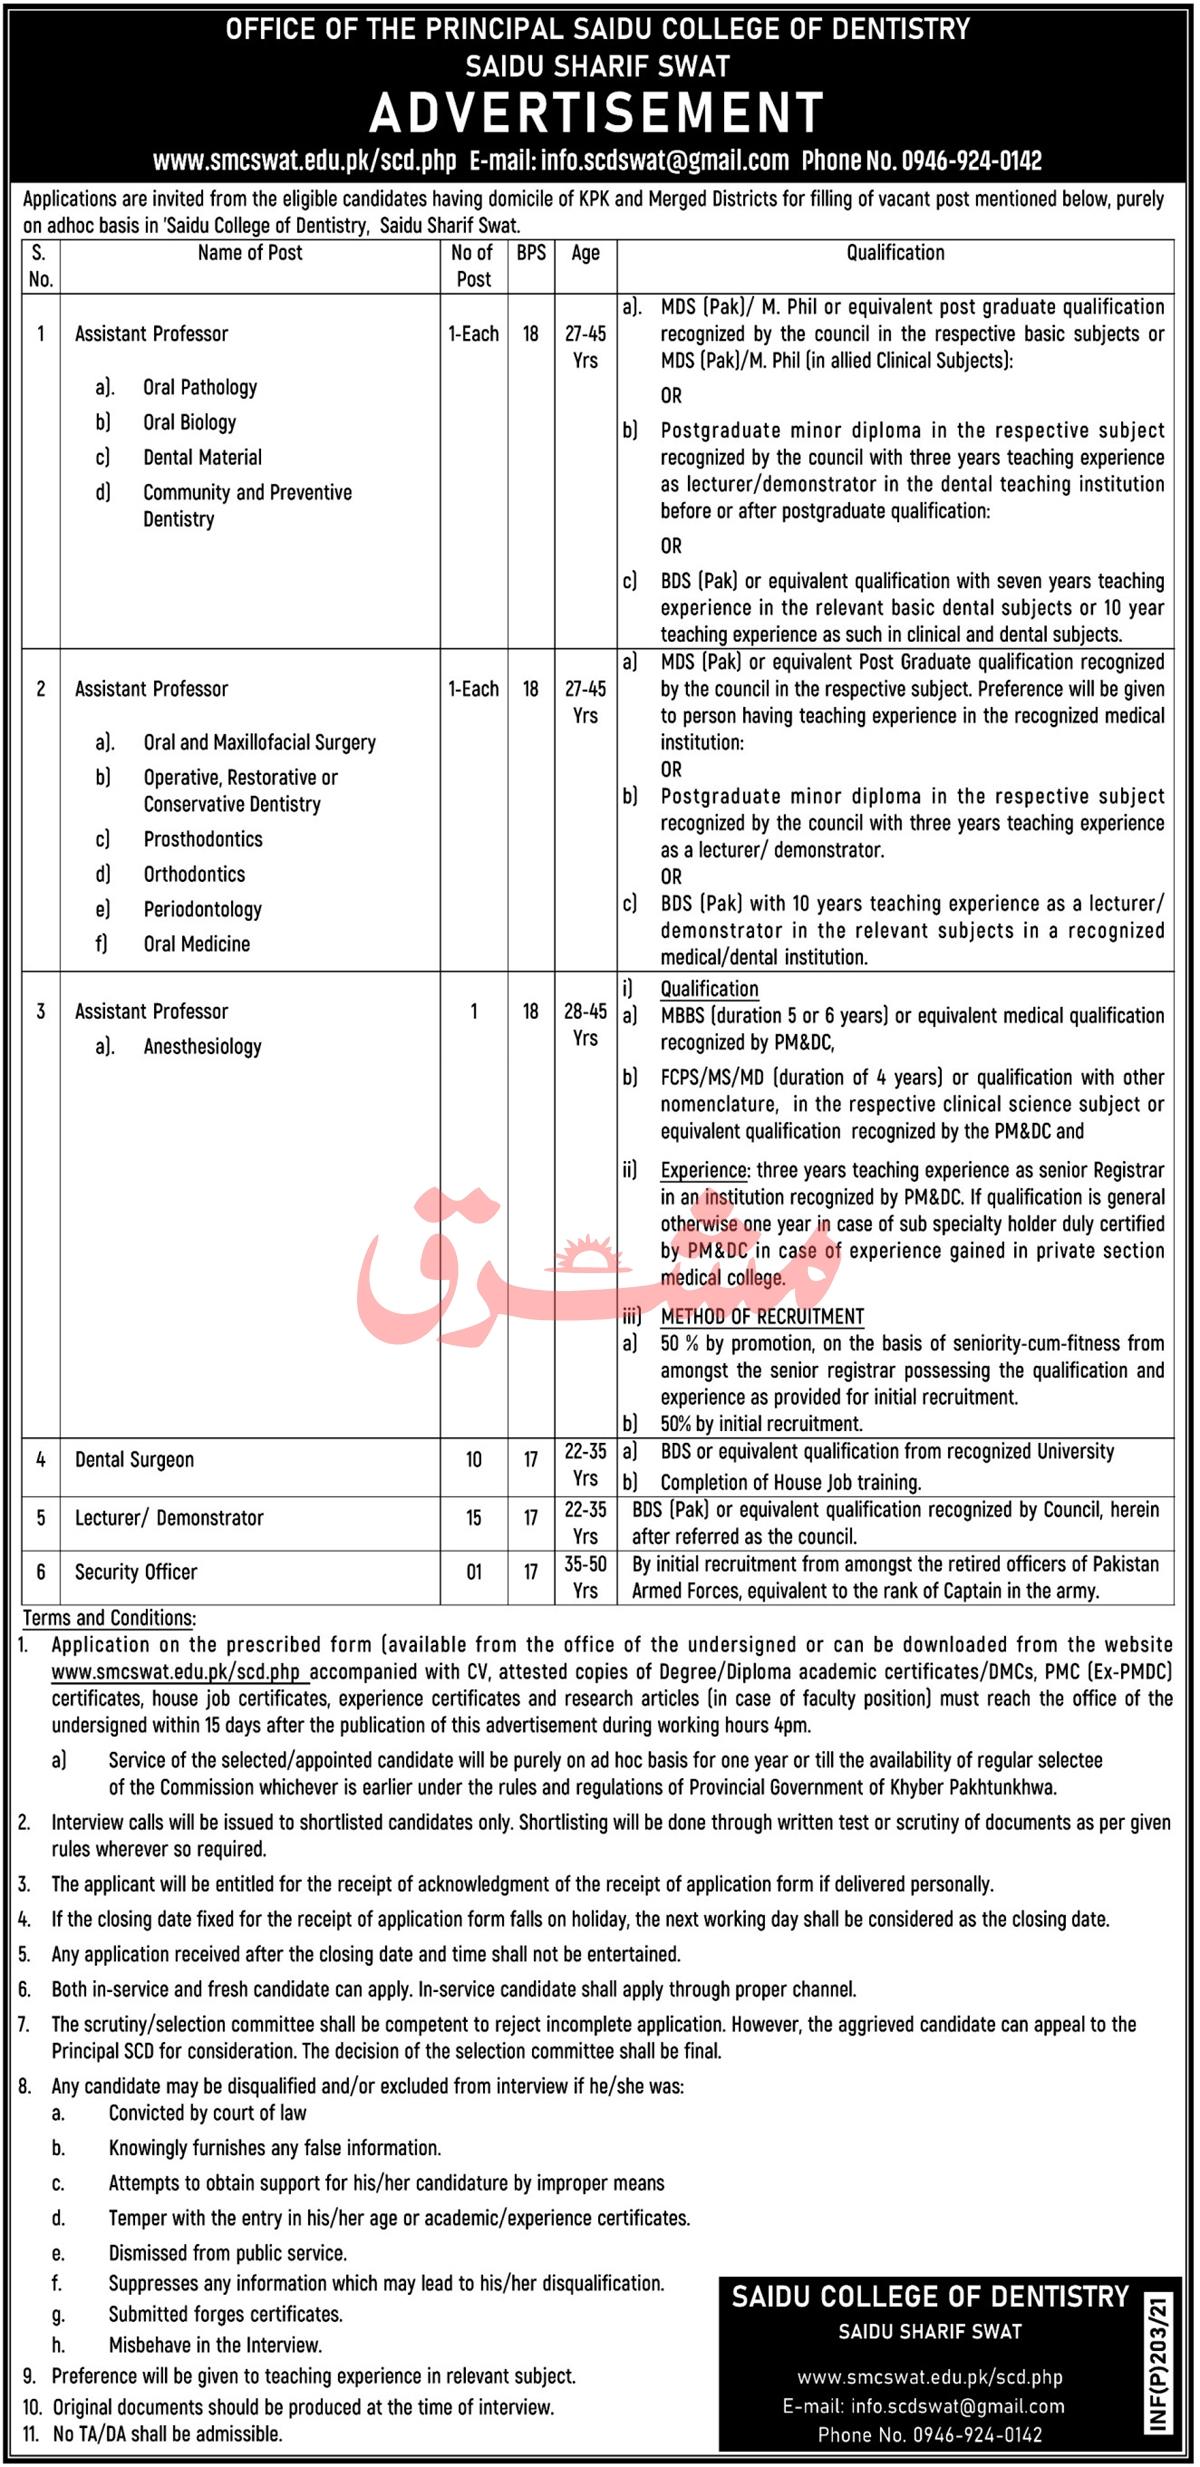 Saidu College of Dentistry Saidu Sharif Swat Jobs 2021 - Download Job Application - www.smcswat.edu.pk/scd.php